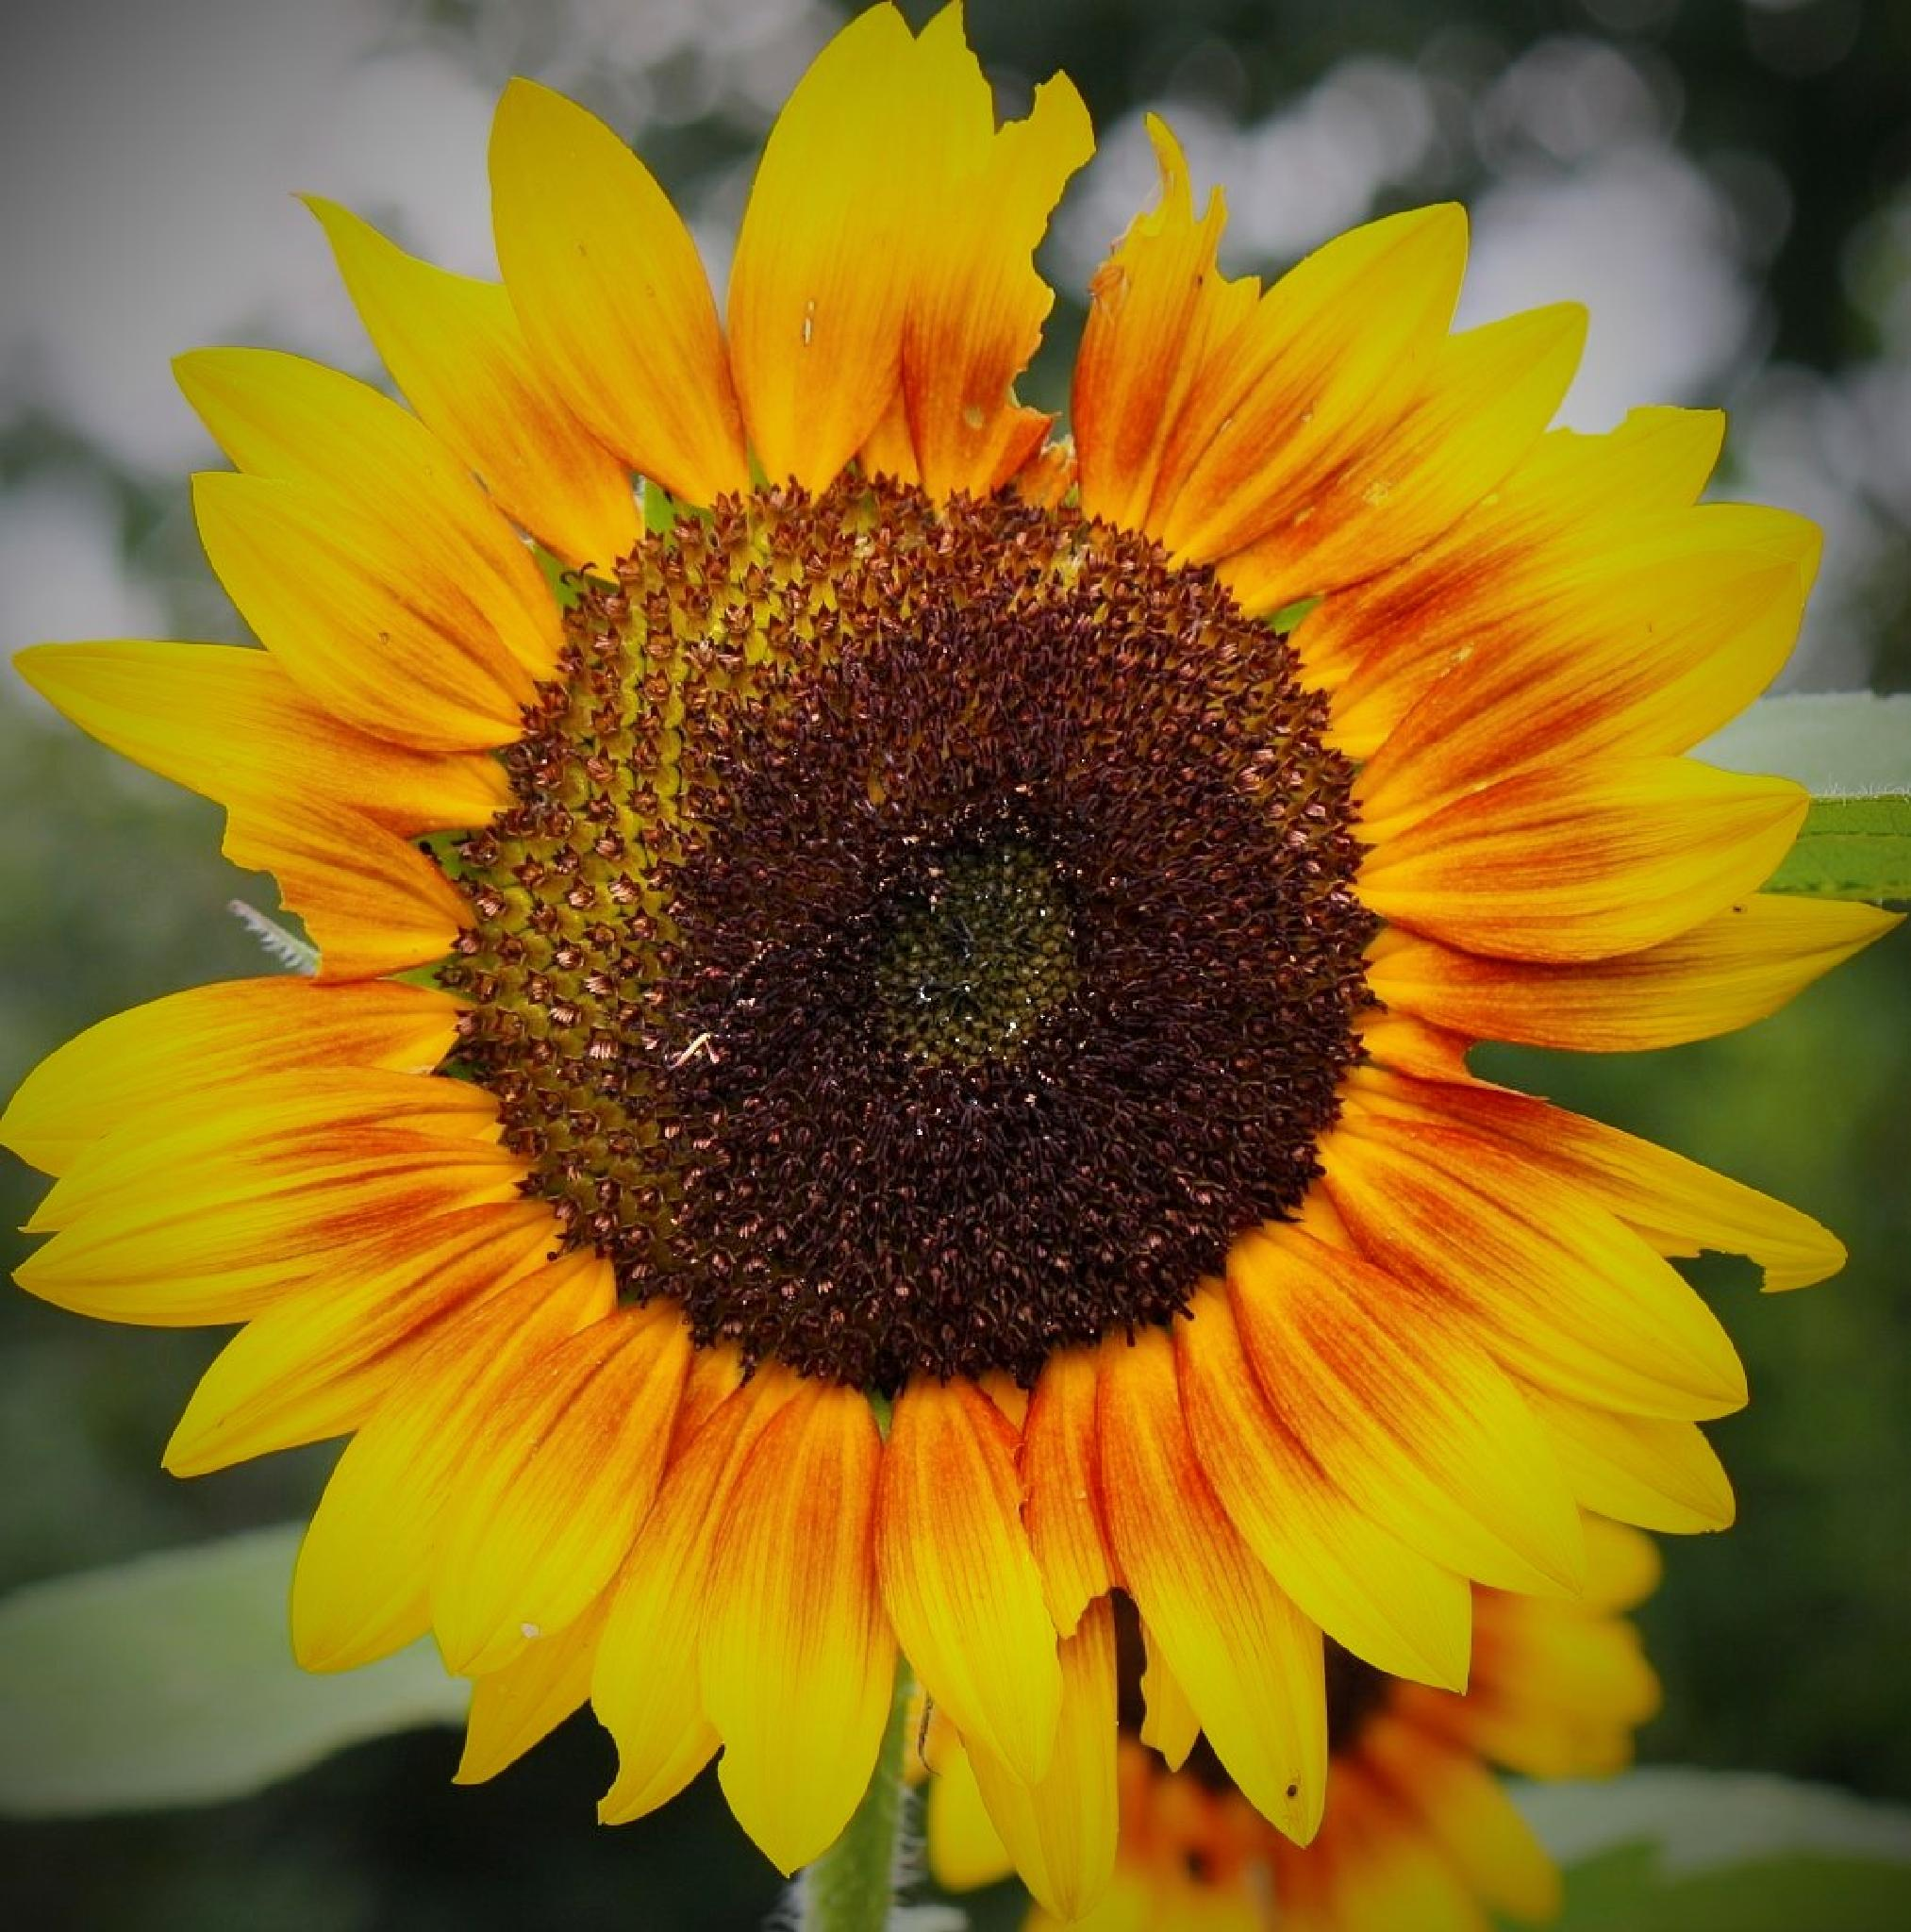 Sunflower by REH